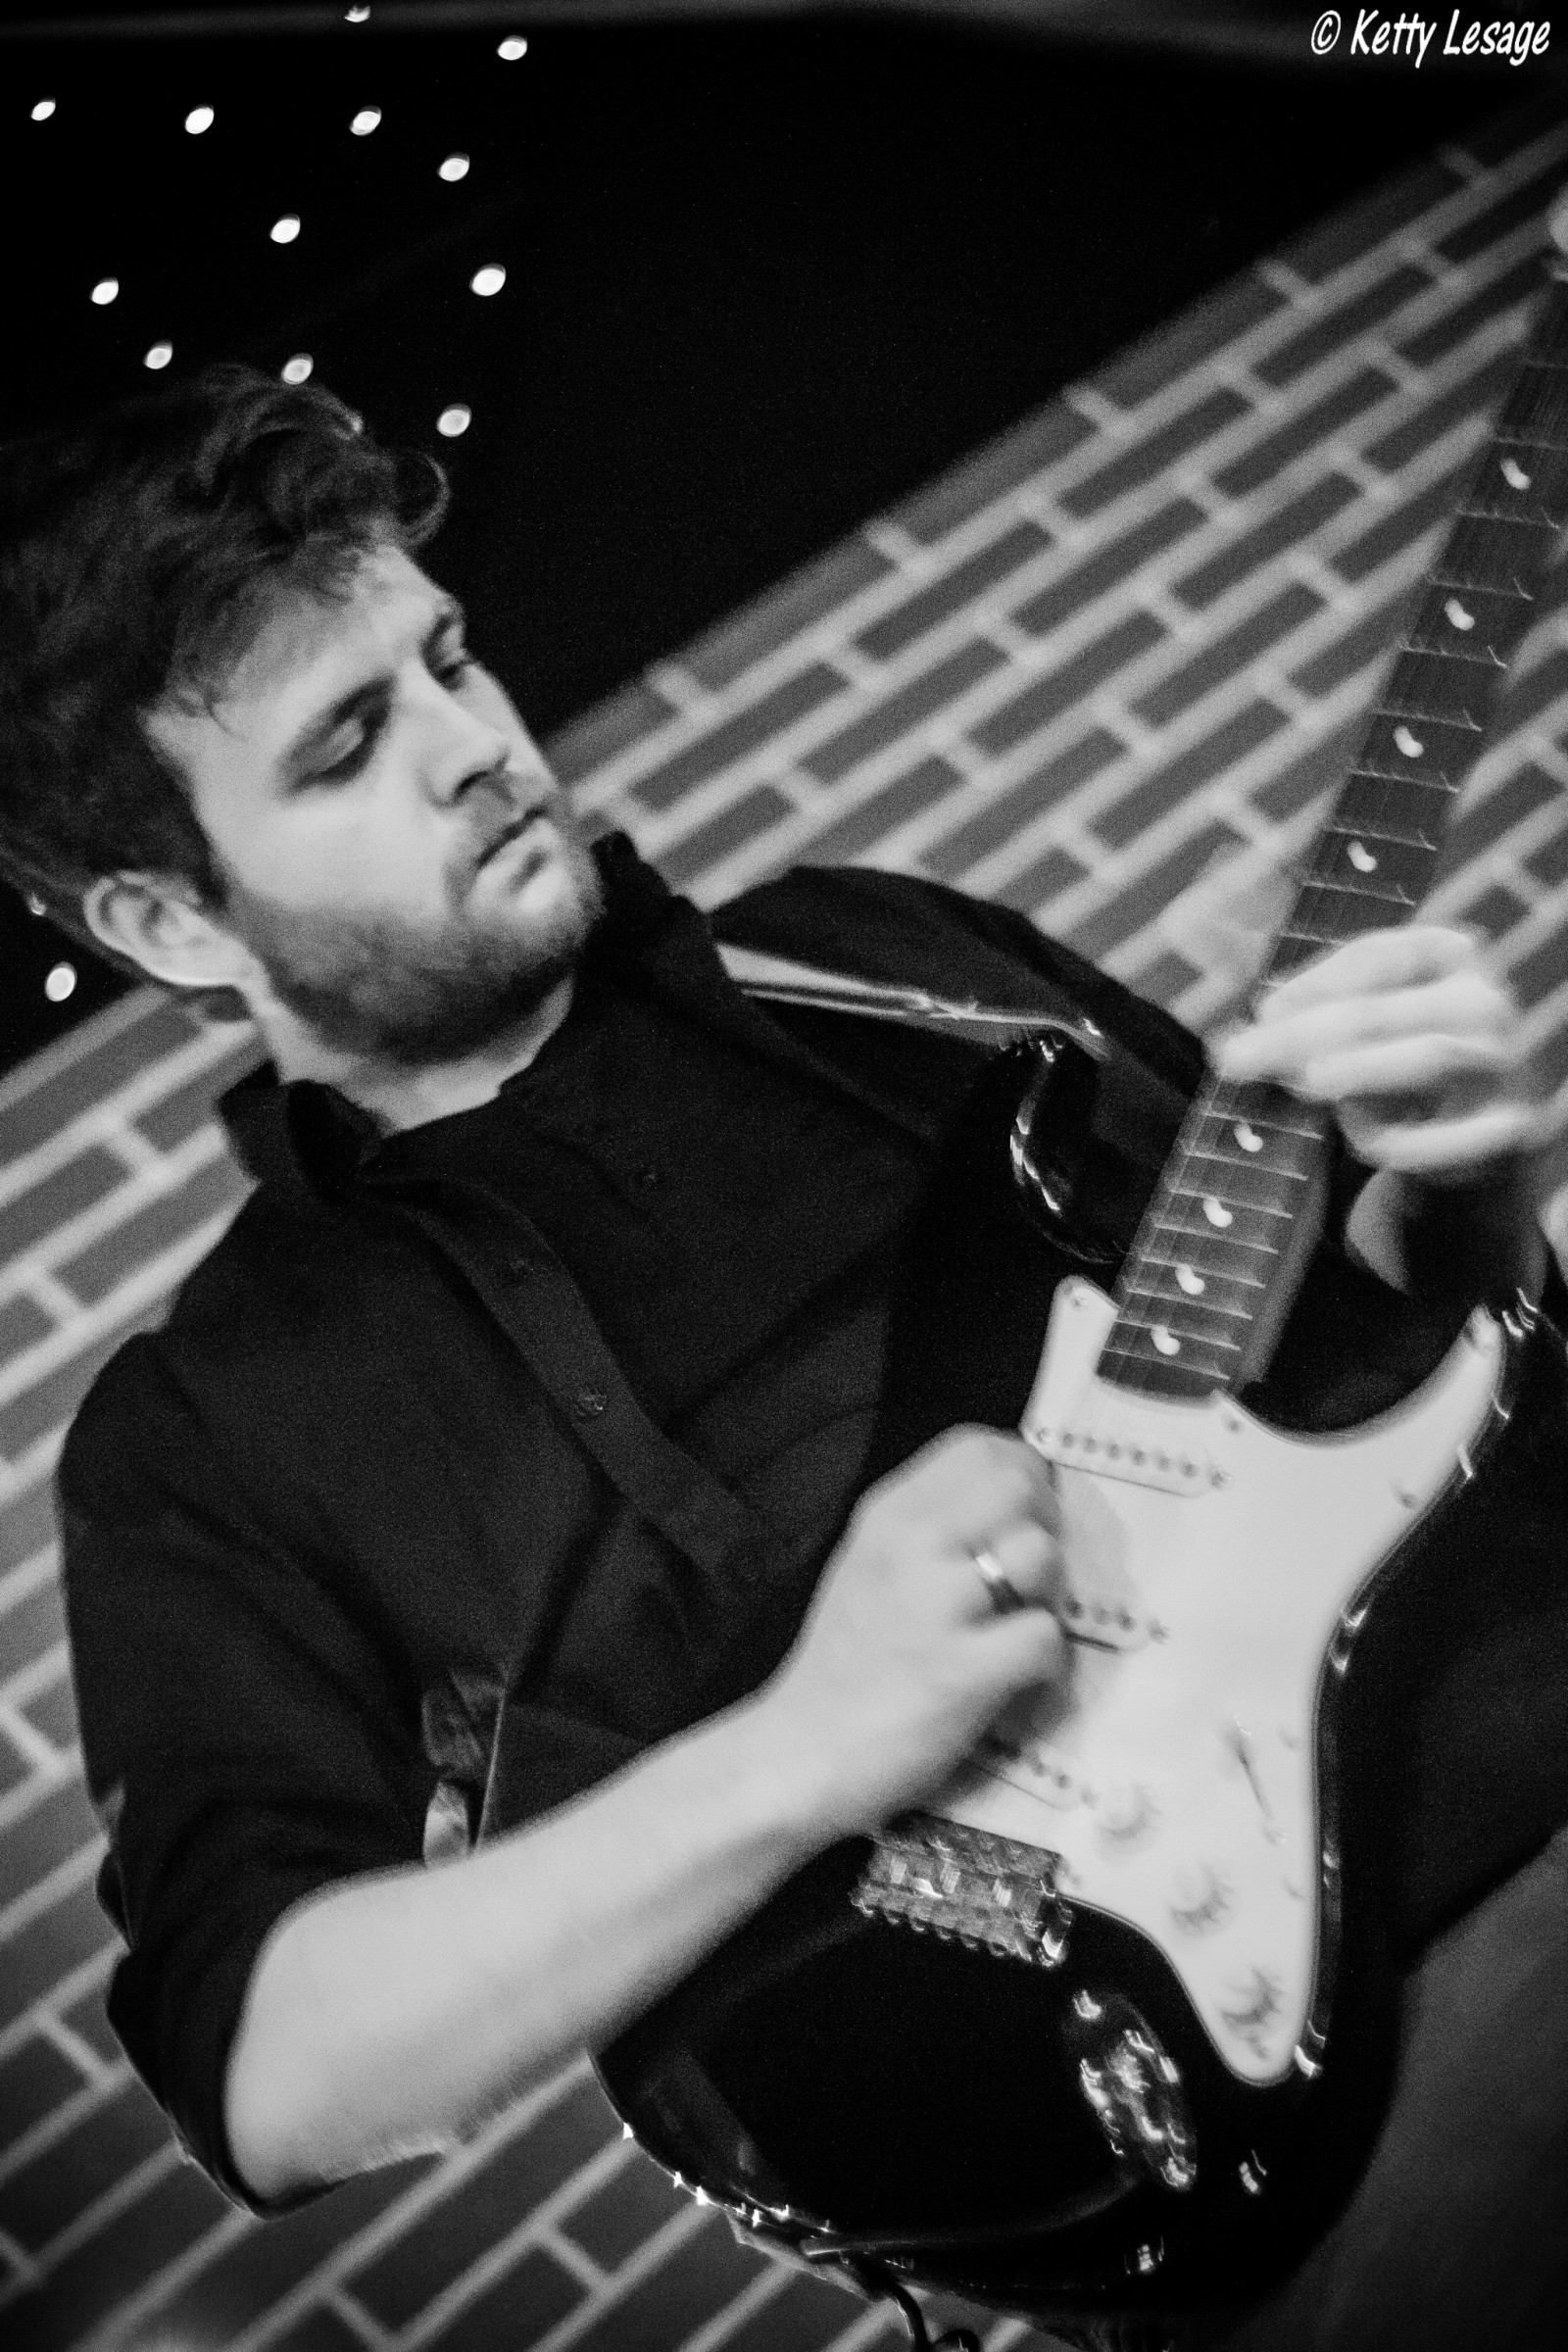 Arthur, guitariste  ©Ketty Lesage